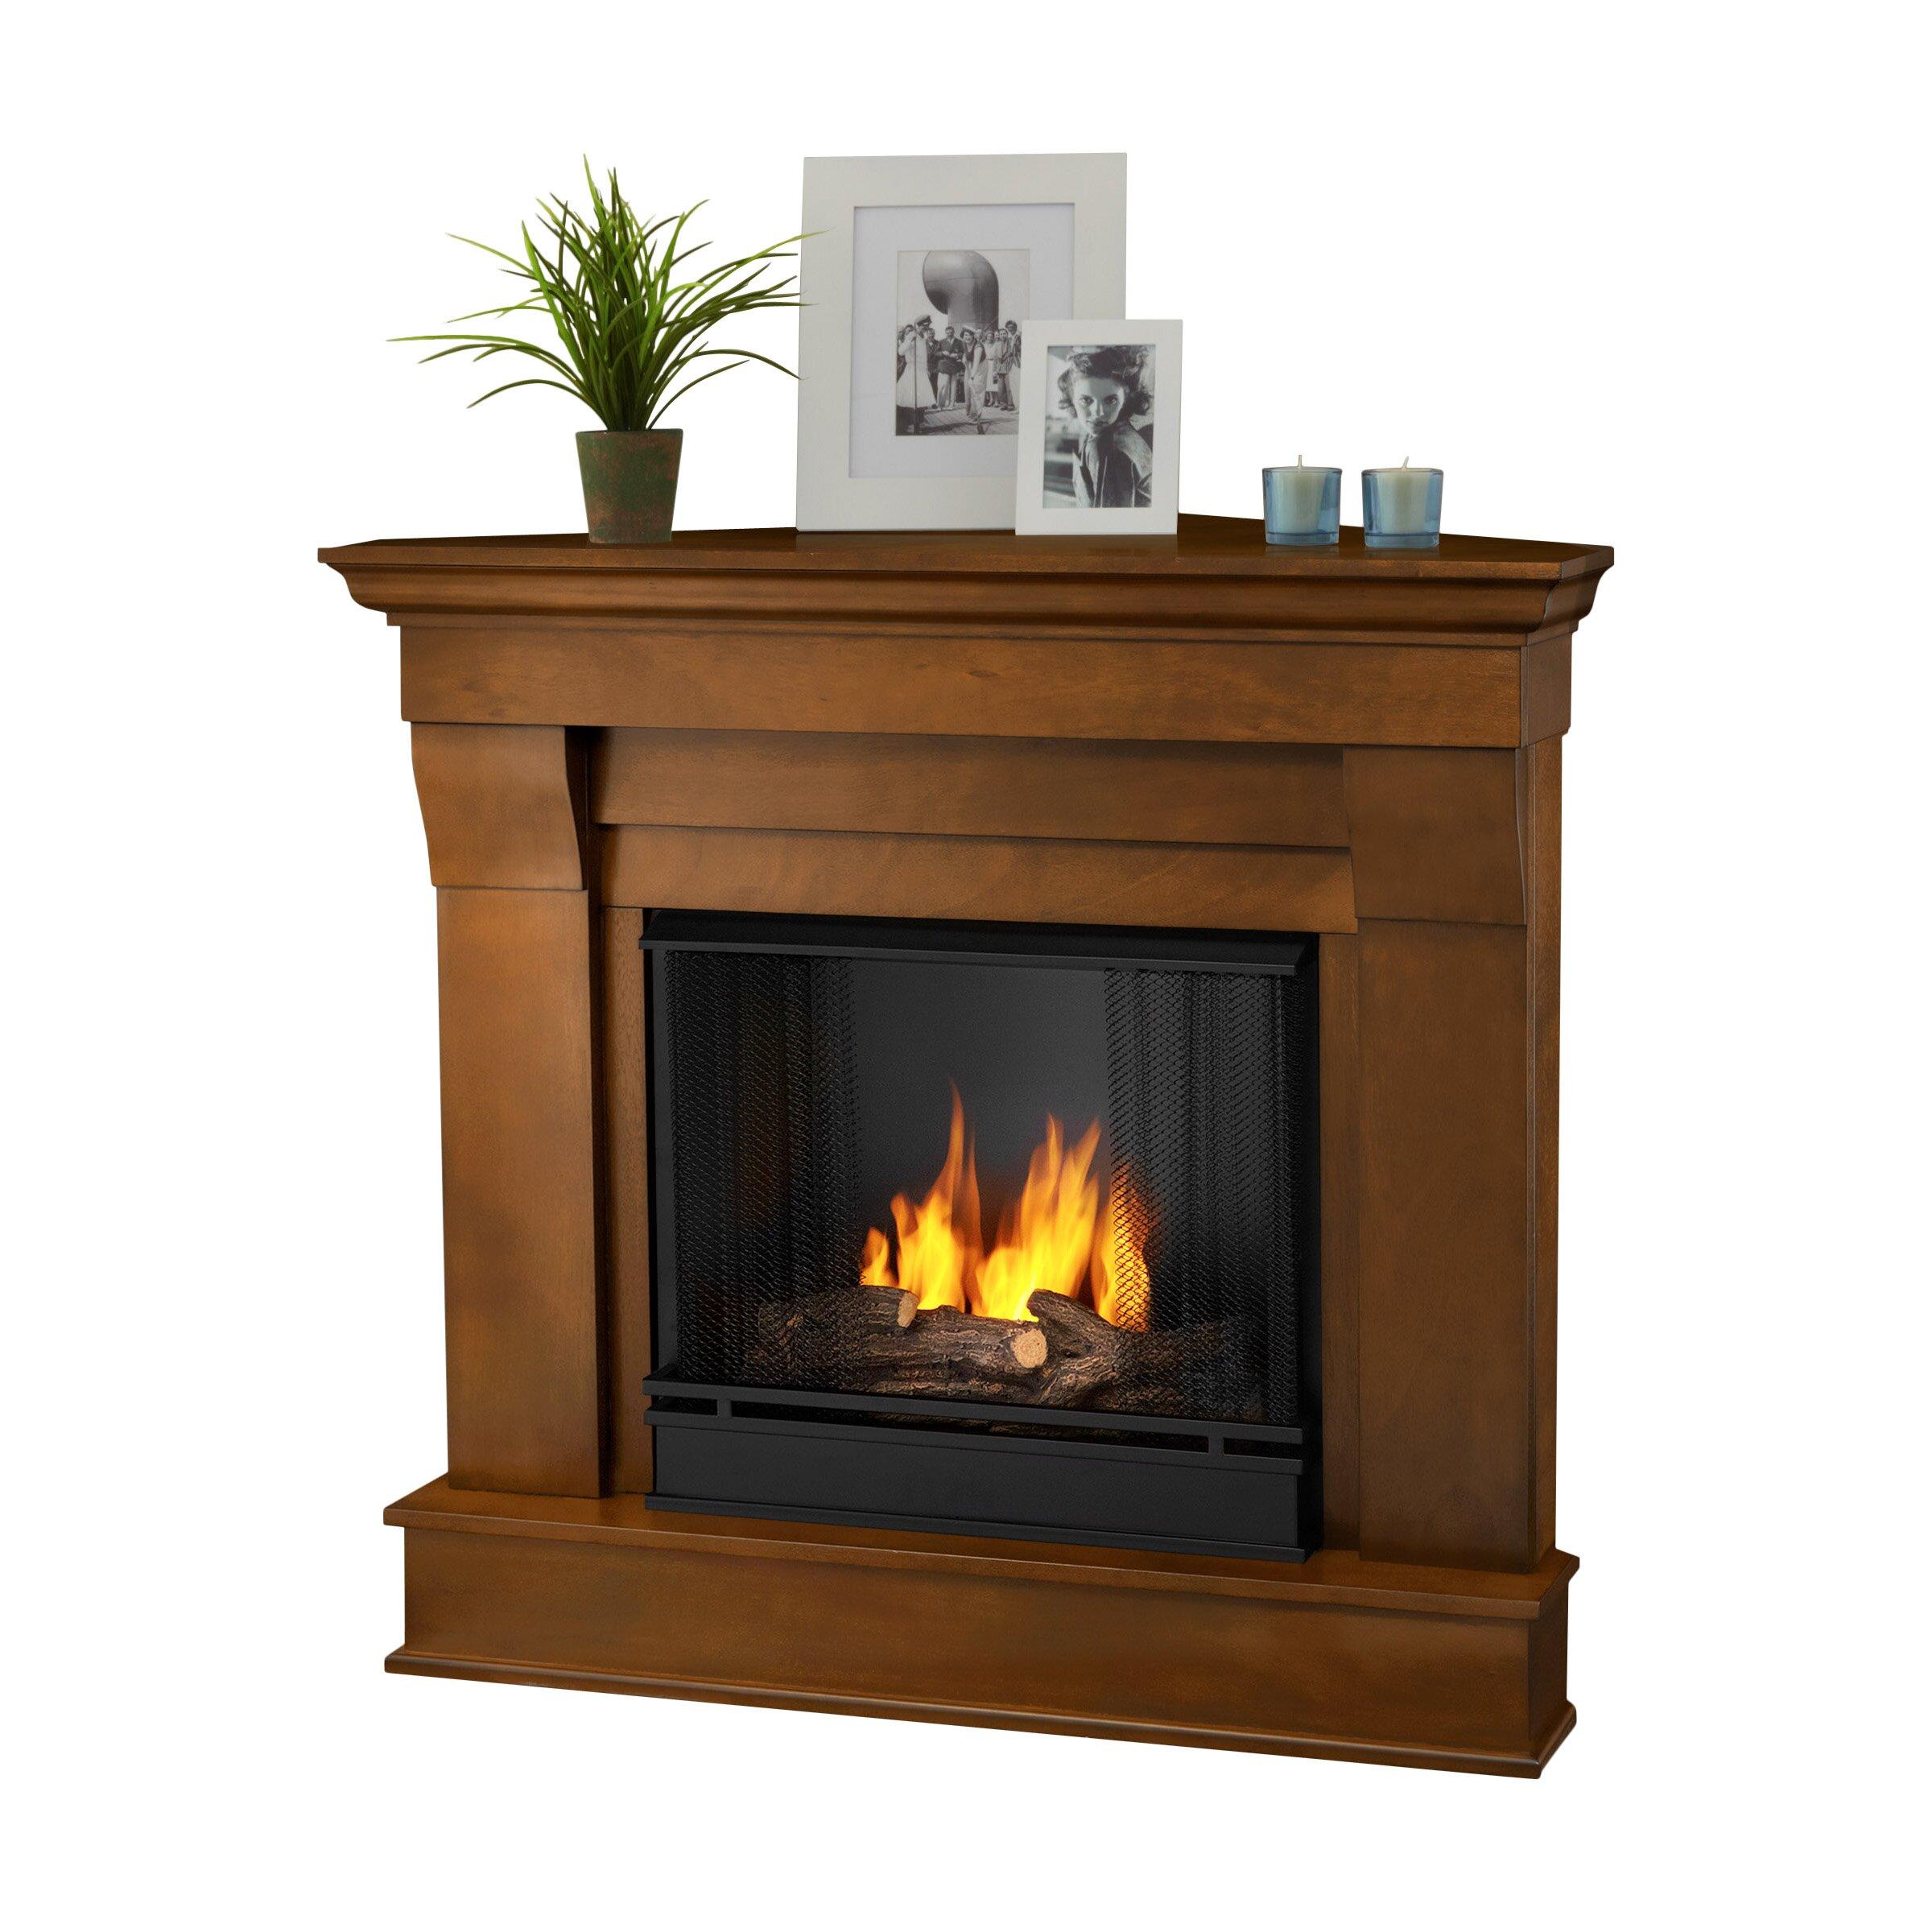 Chateau corner gel fireplace wayfair supply for Wayfair gel fireplace